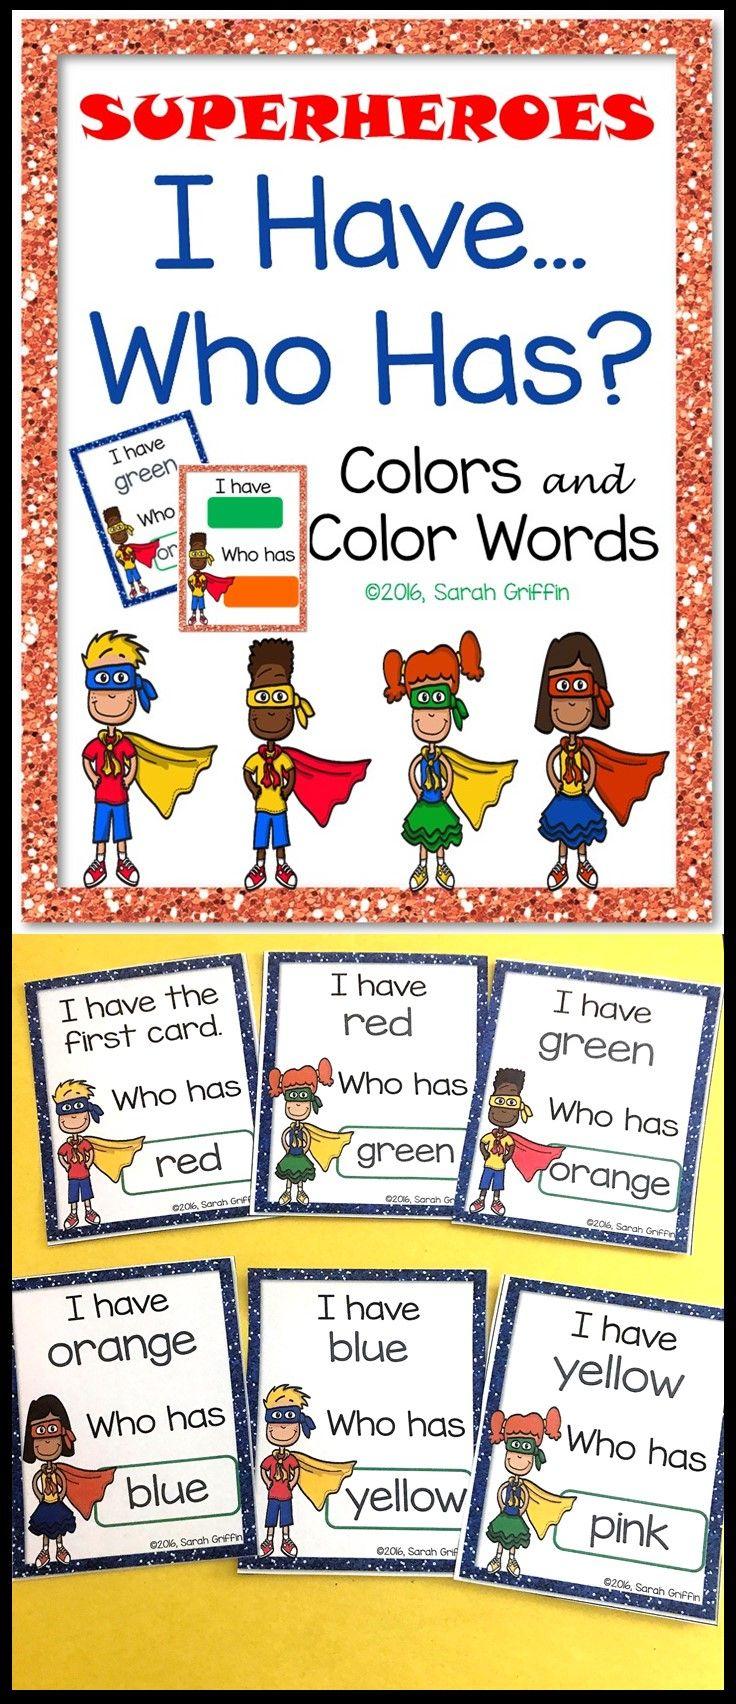 color games kindergarten : The 25 Best Ideas About Color Words Kindergarten On Pinterest English Worksheets For Kindergarten Color Activities Kindergarten And English Kindergarten